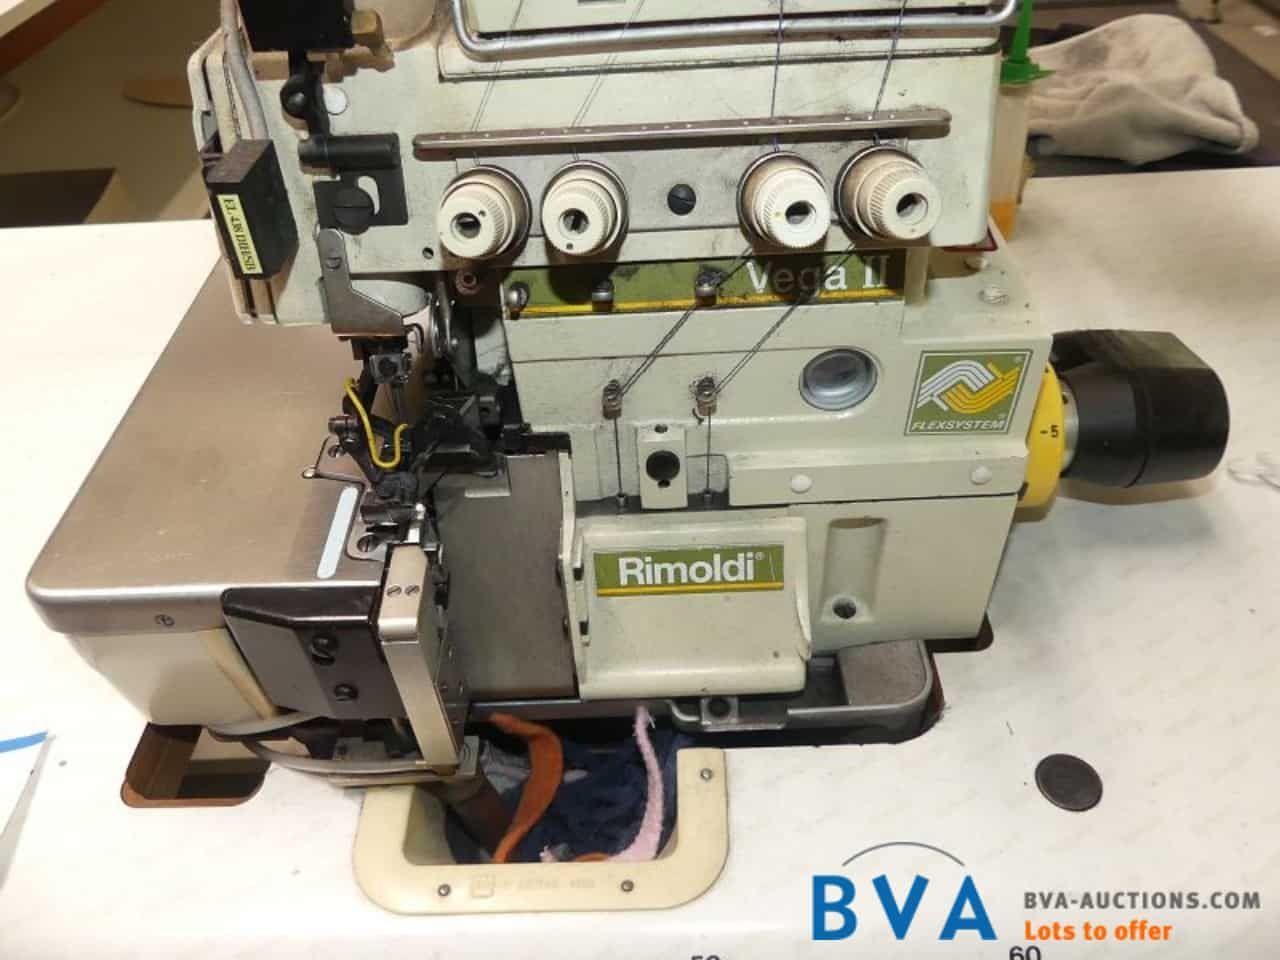 4-Faden-2-Nadel-Overlock-Nähmaschine Rimoldi VegaII